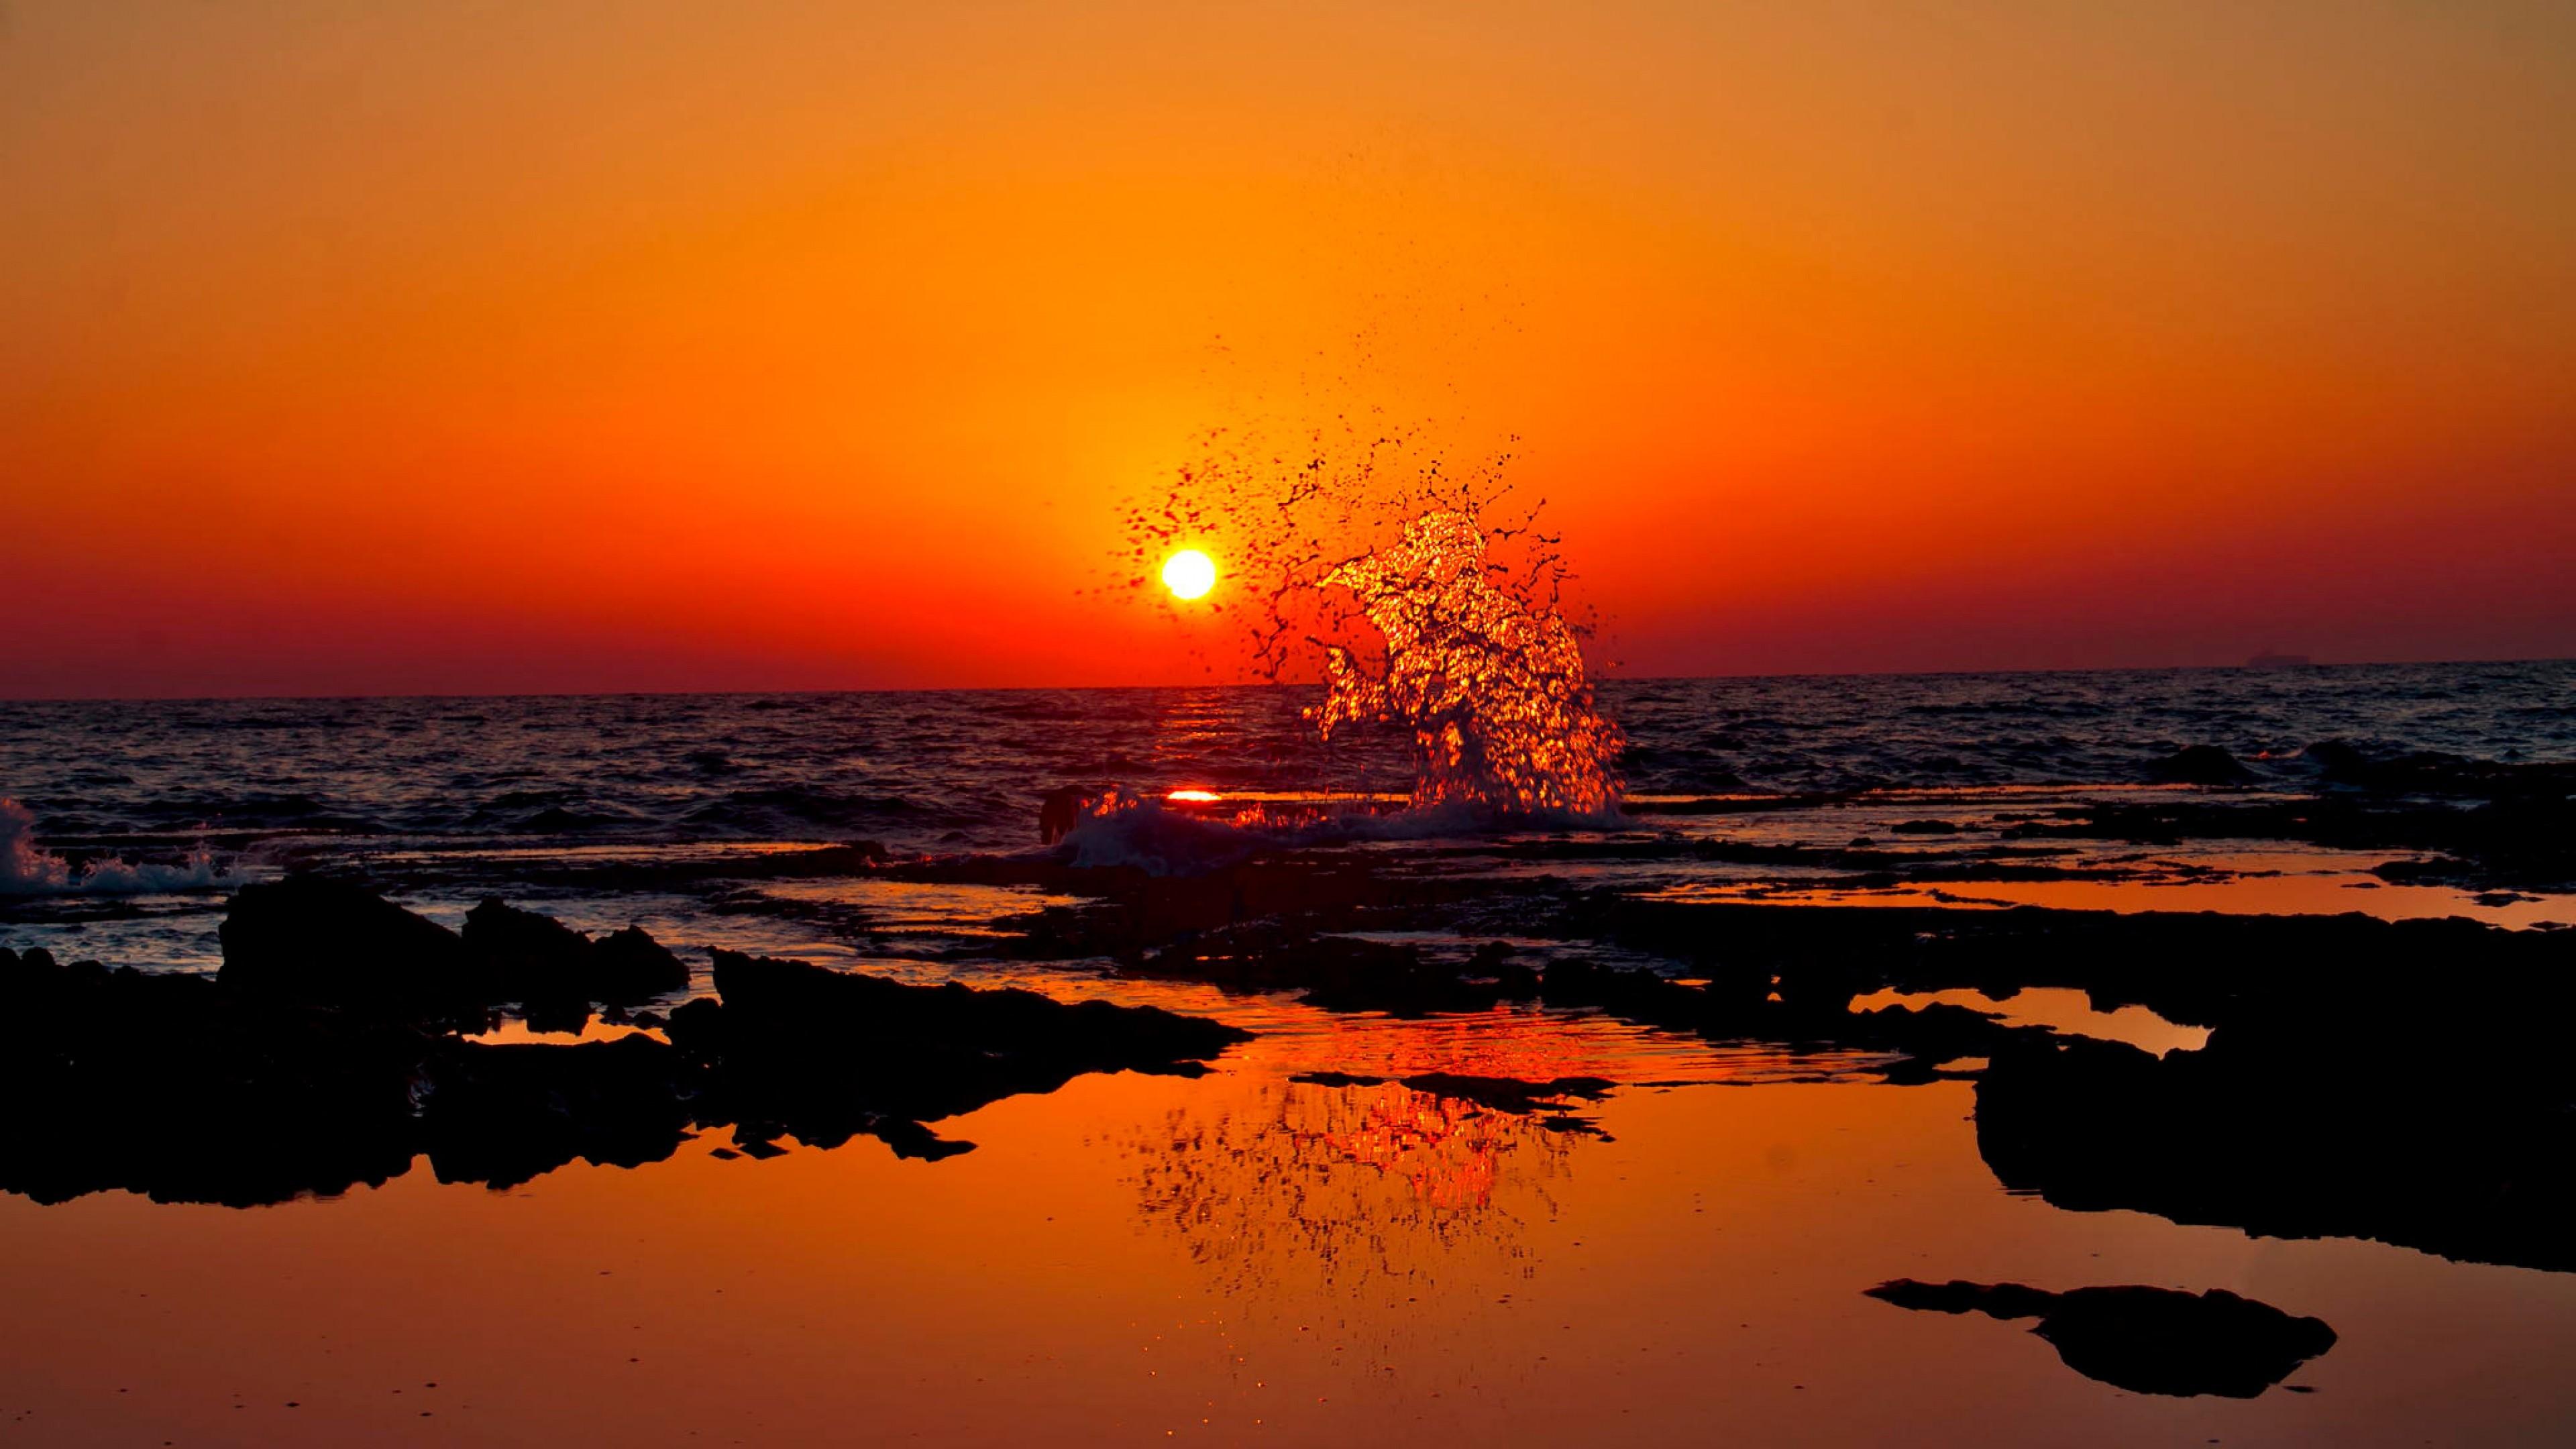 Wallpaper india, sunset, splash, beach, ocean